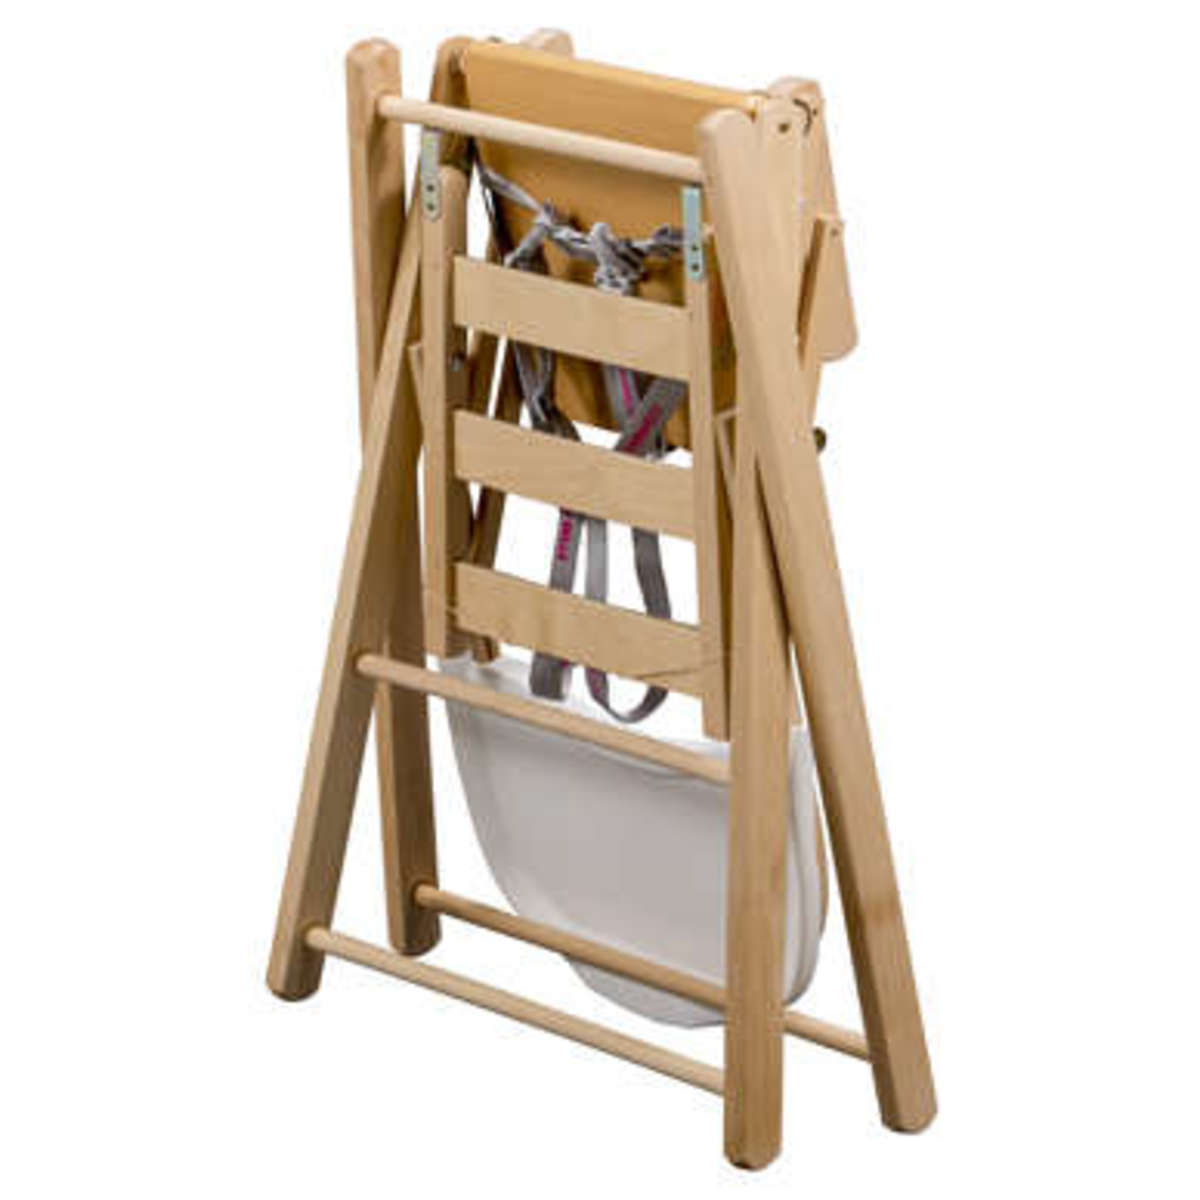 Pliante Taupe Haute Extra Chaise Sarah JclKTF13